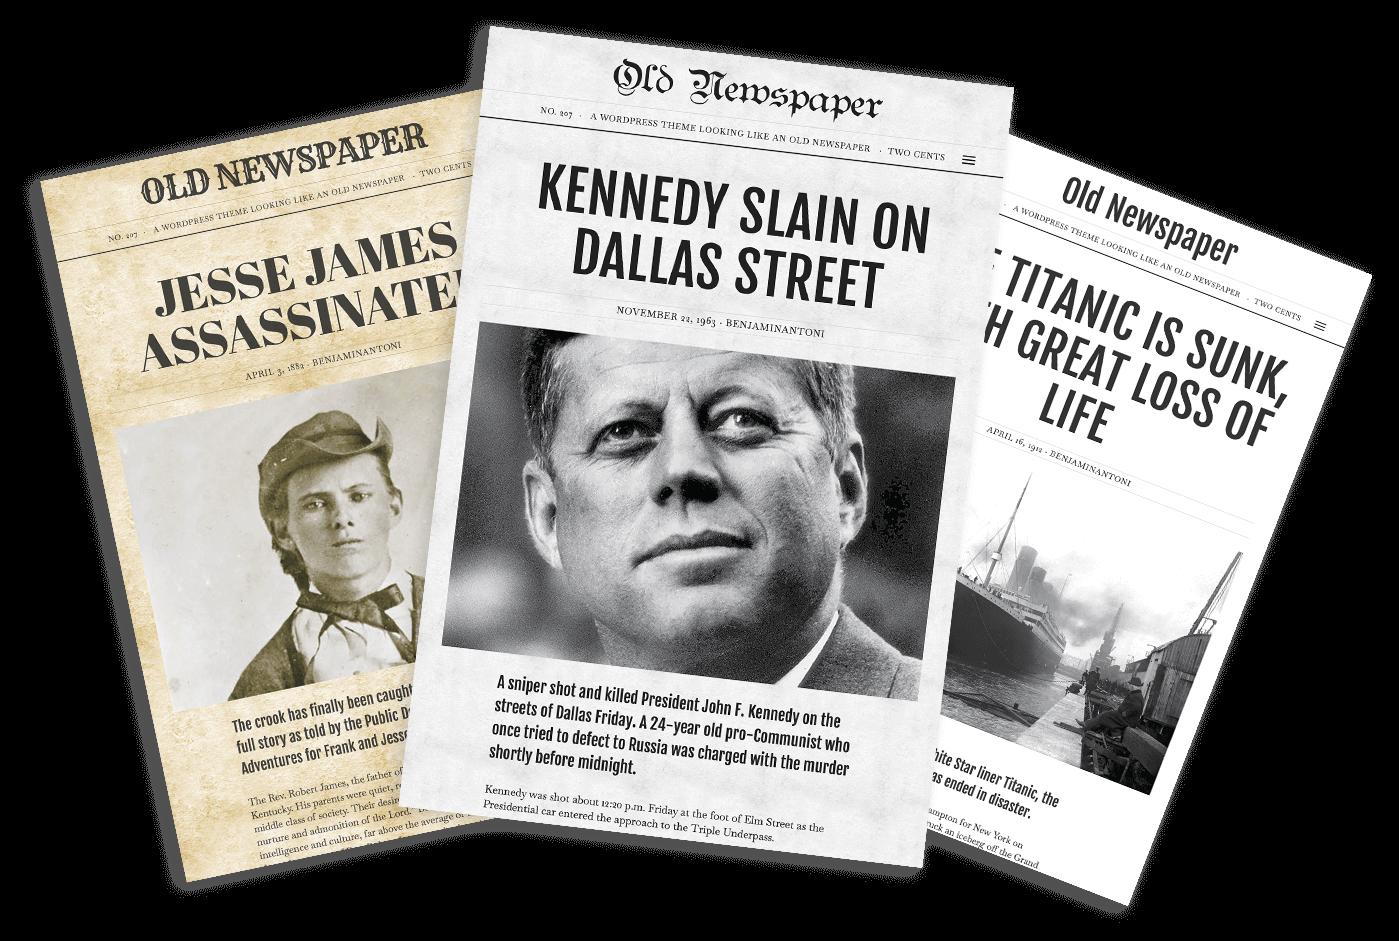 Old Newspaper WordPress Theme Styles